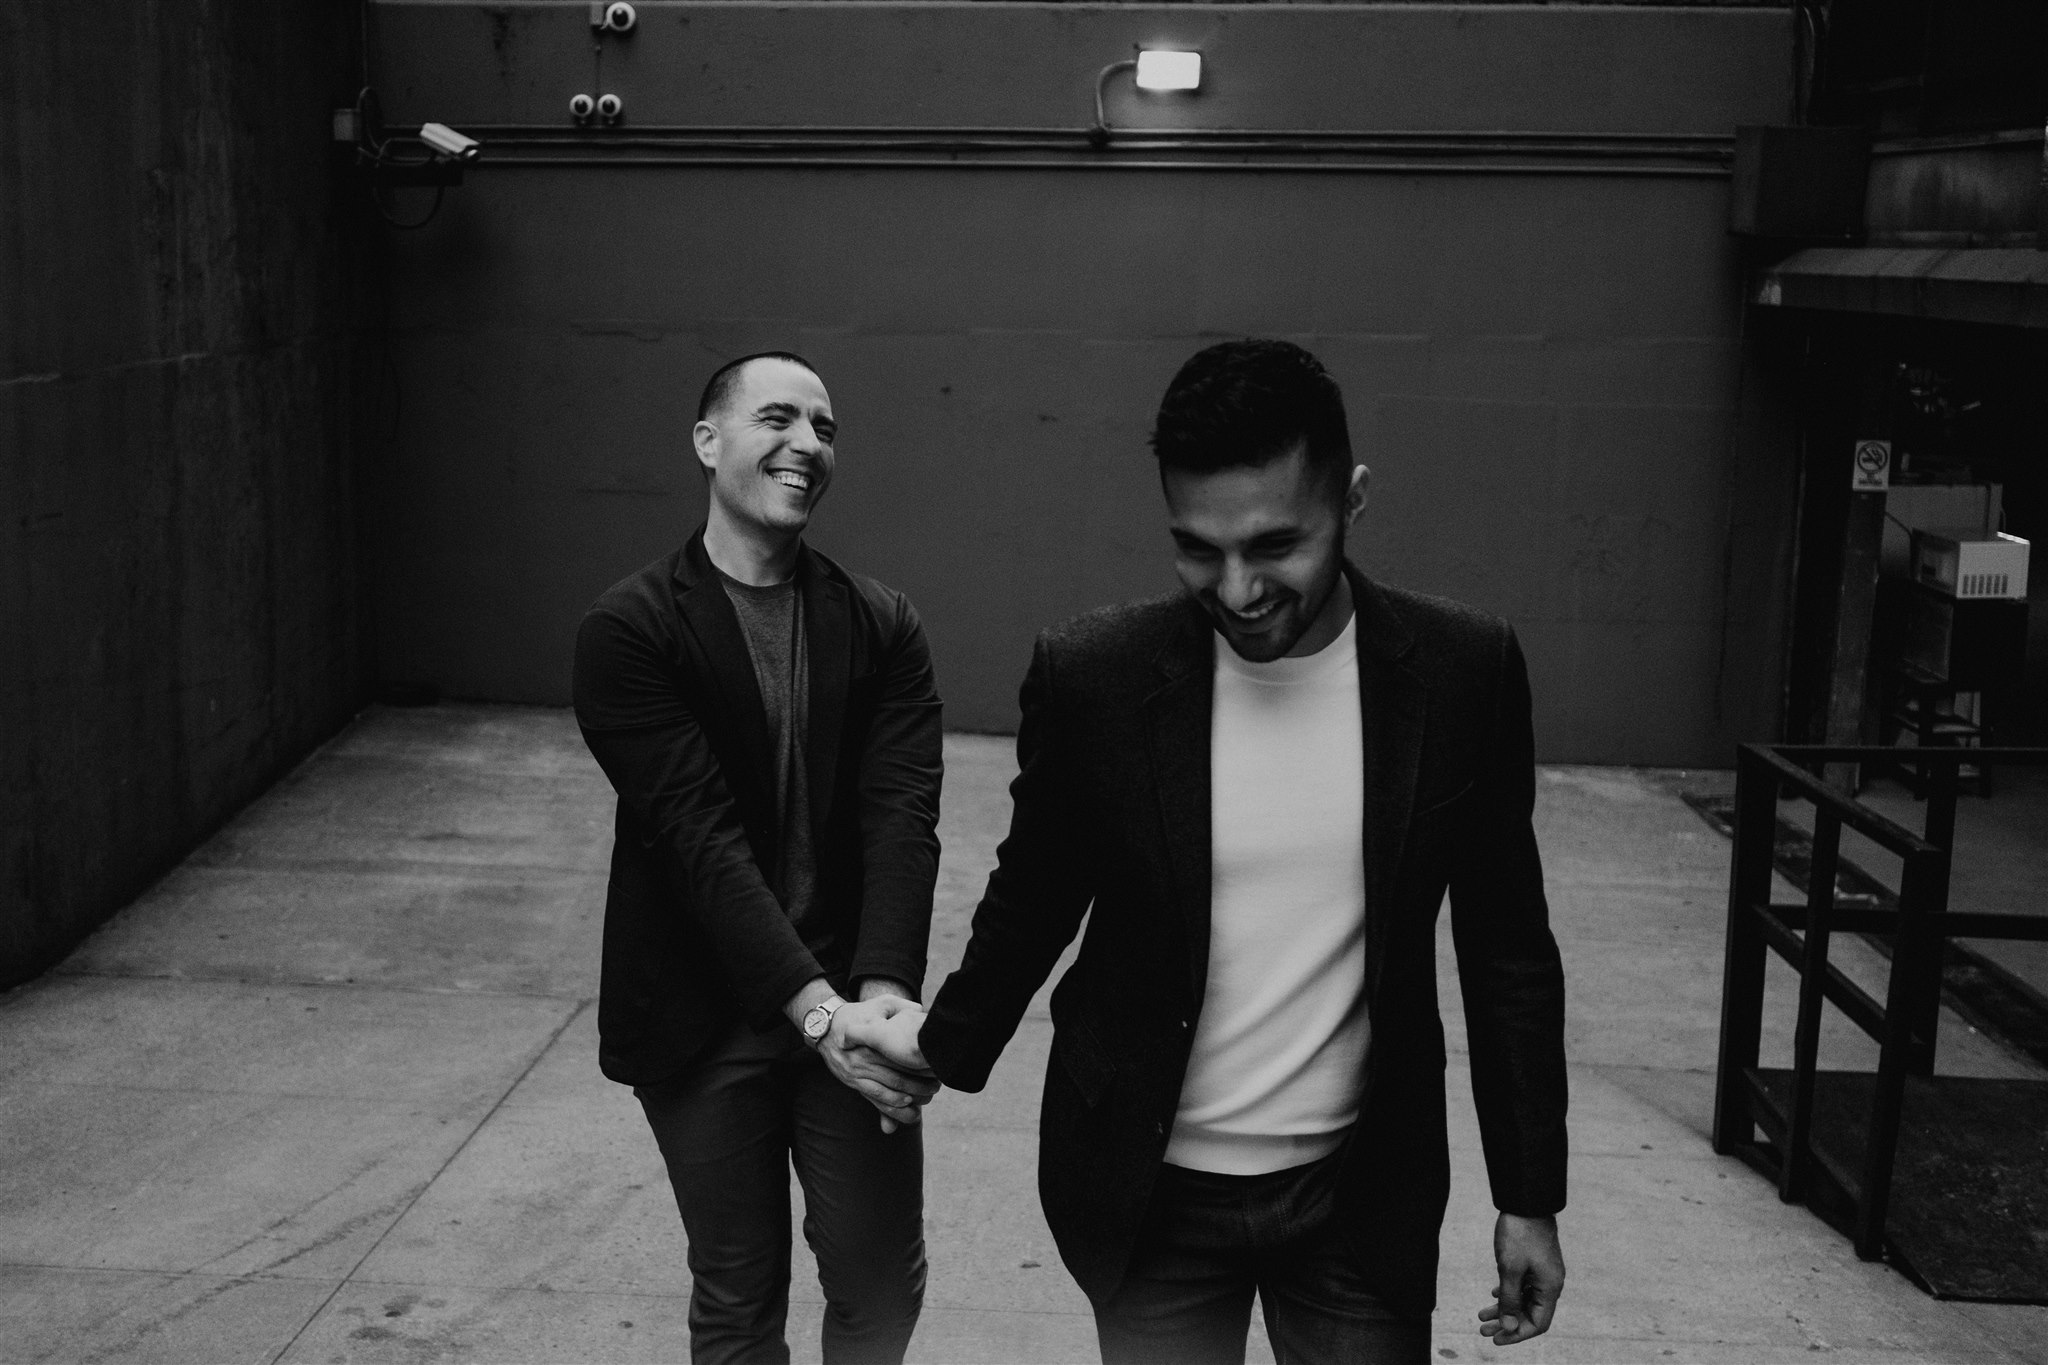 lbgtq-gay-wedding-elopement-photography-chellise-michael-photography302.JPG